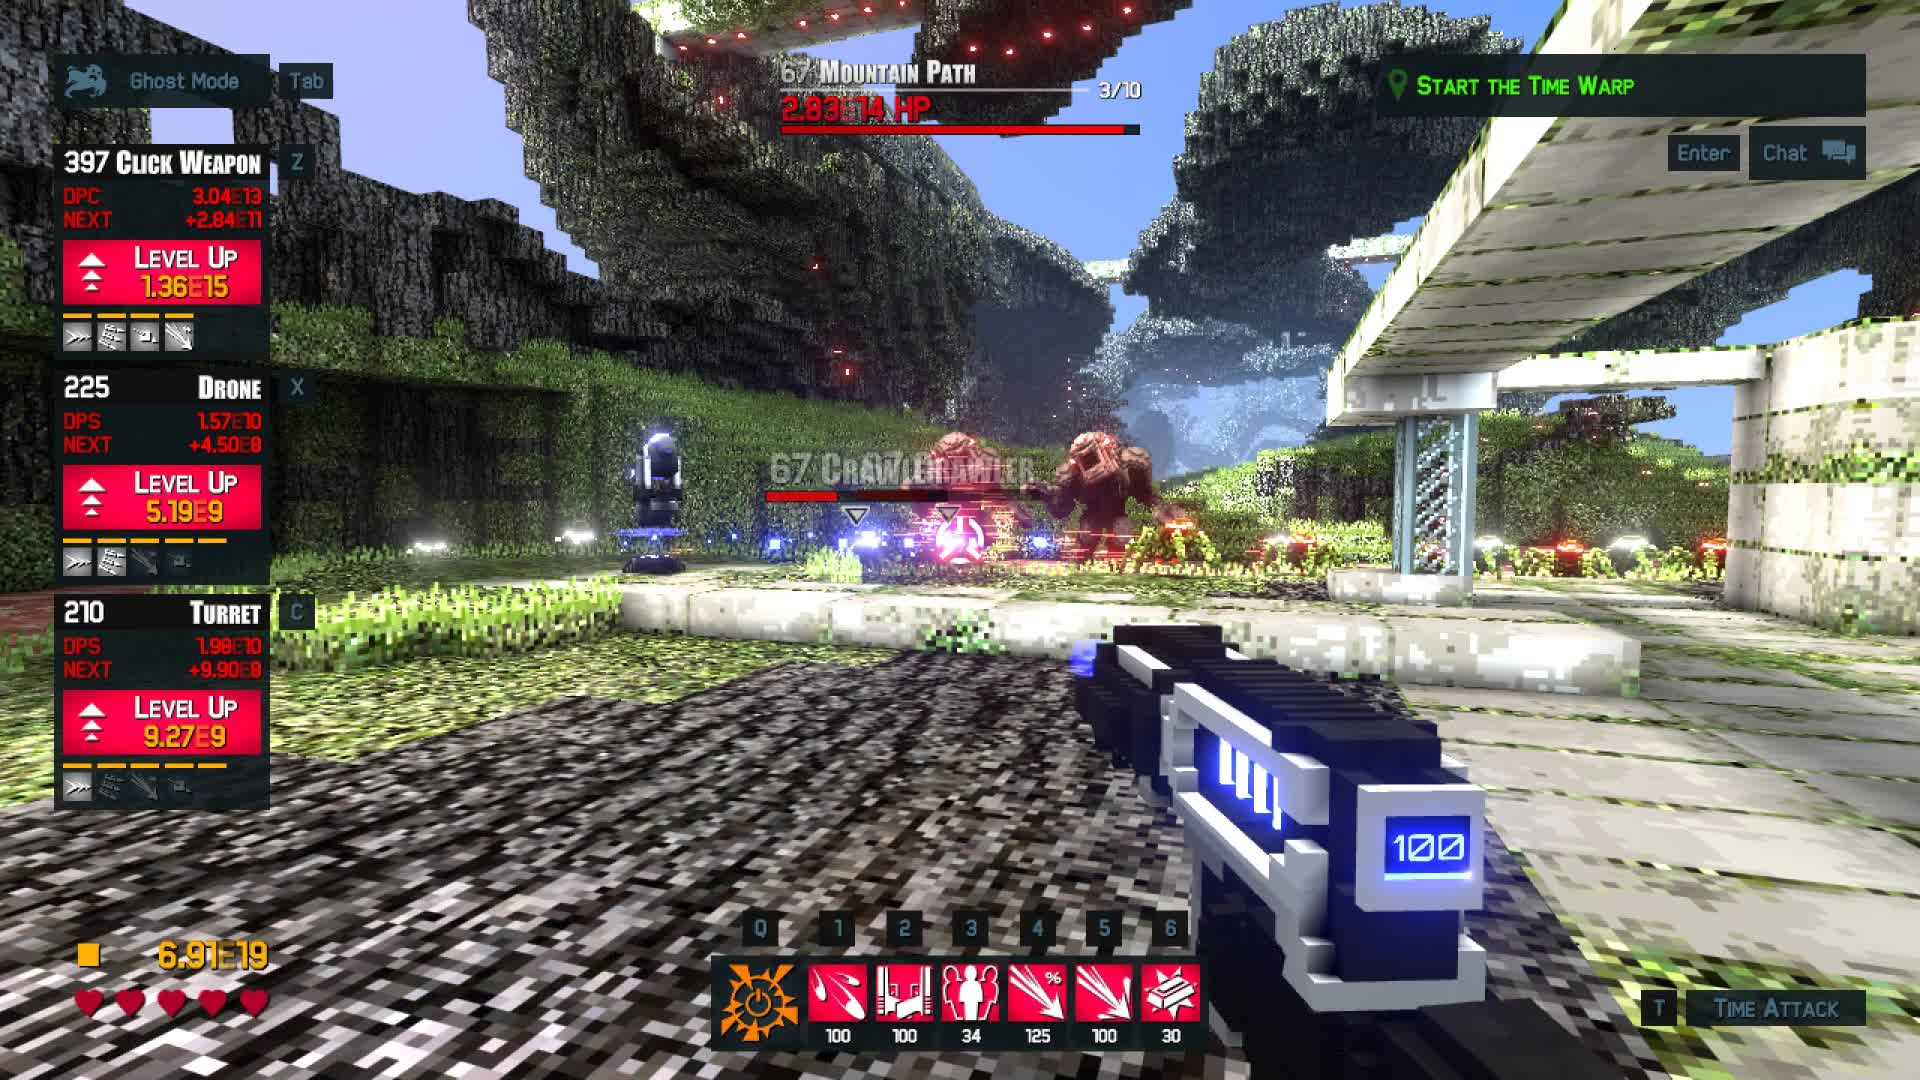 Clicker, FPS, Game, Incremental, Proton Studio, RPG, Time Clickers 2, Time Warpers, Video Game, Time Warpers Plasma Rifle GIFs